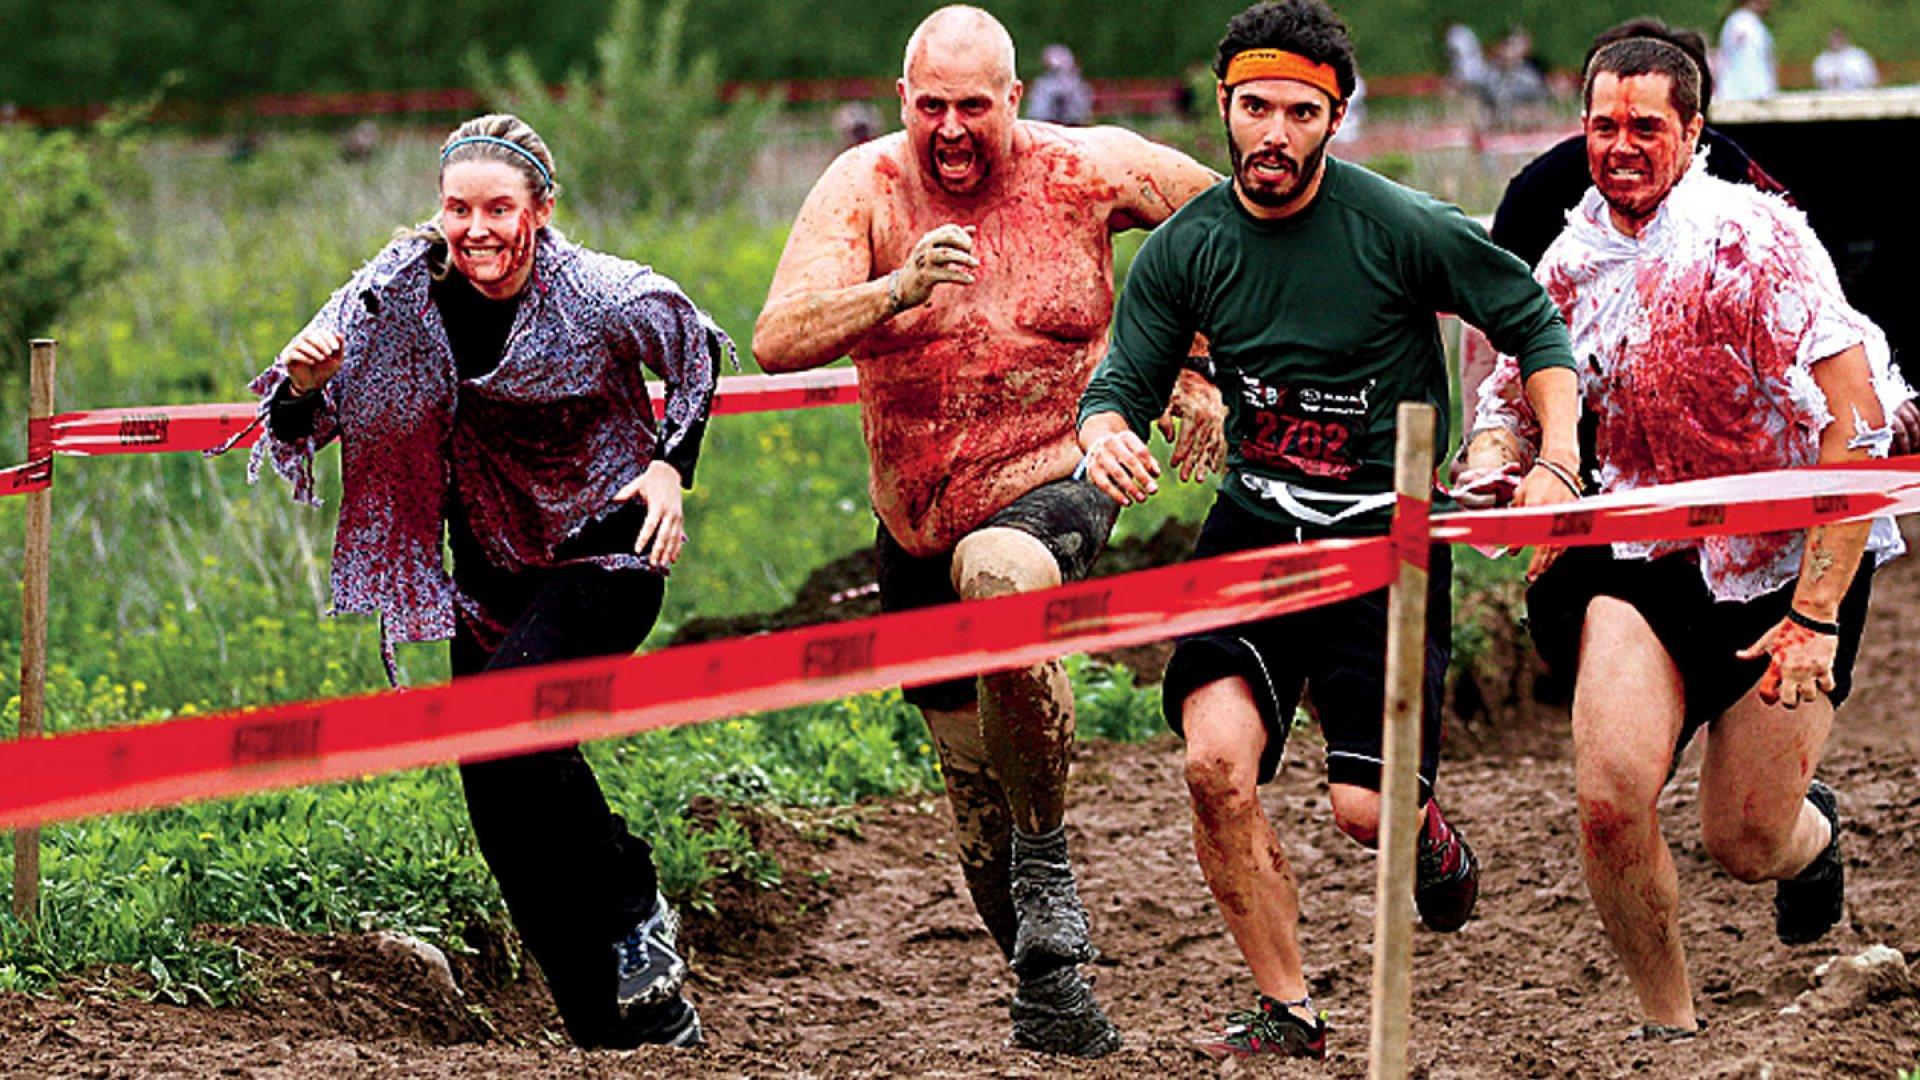 <b>Brains!</b> A Boston runner had plenty of motivation.